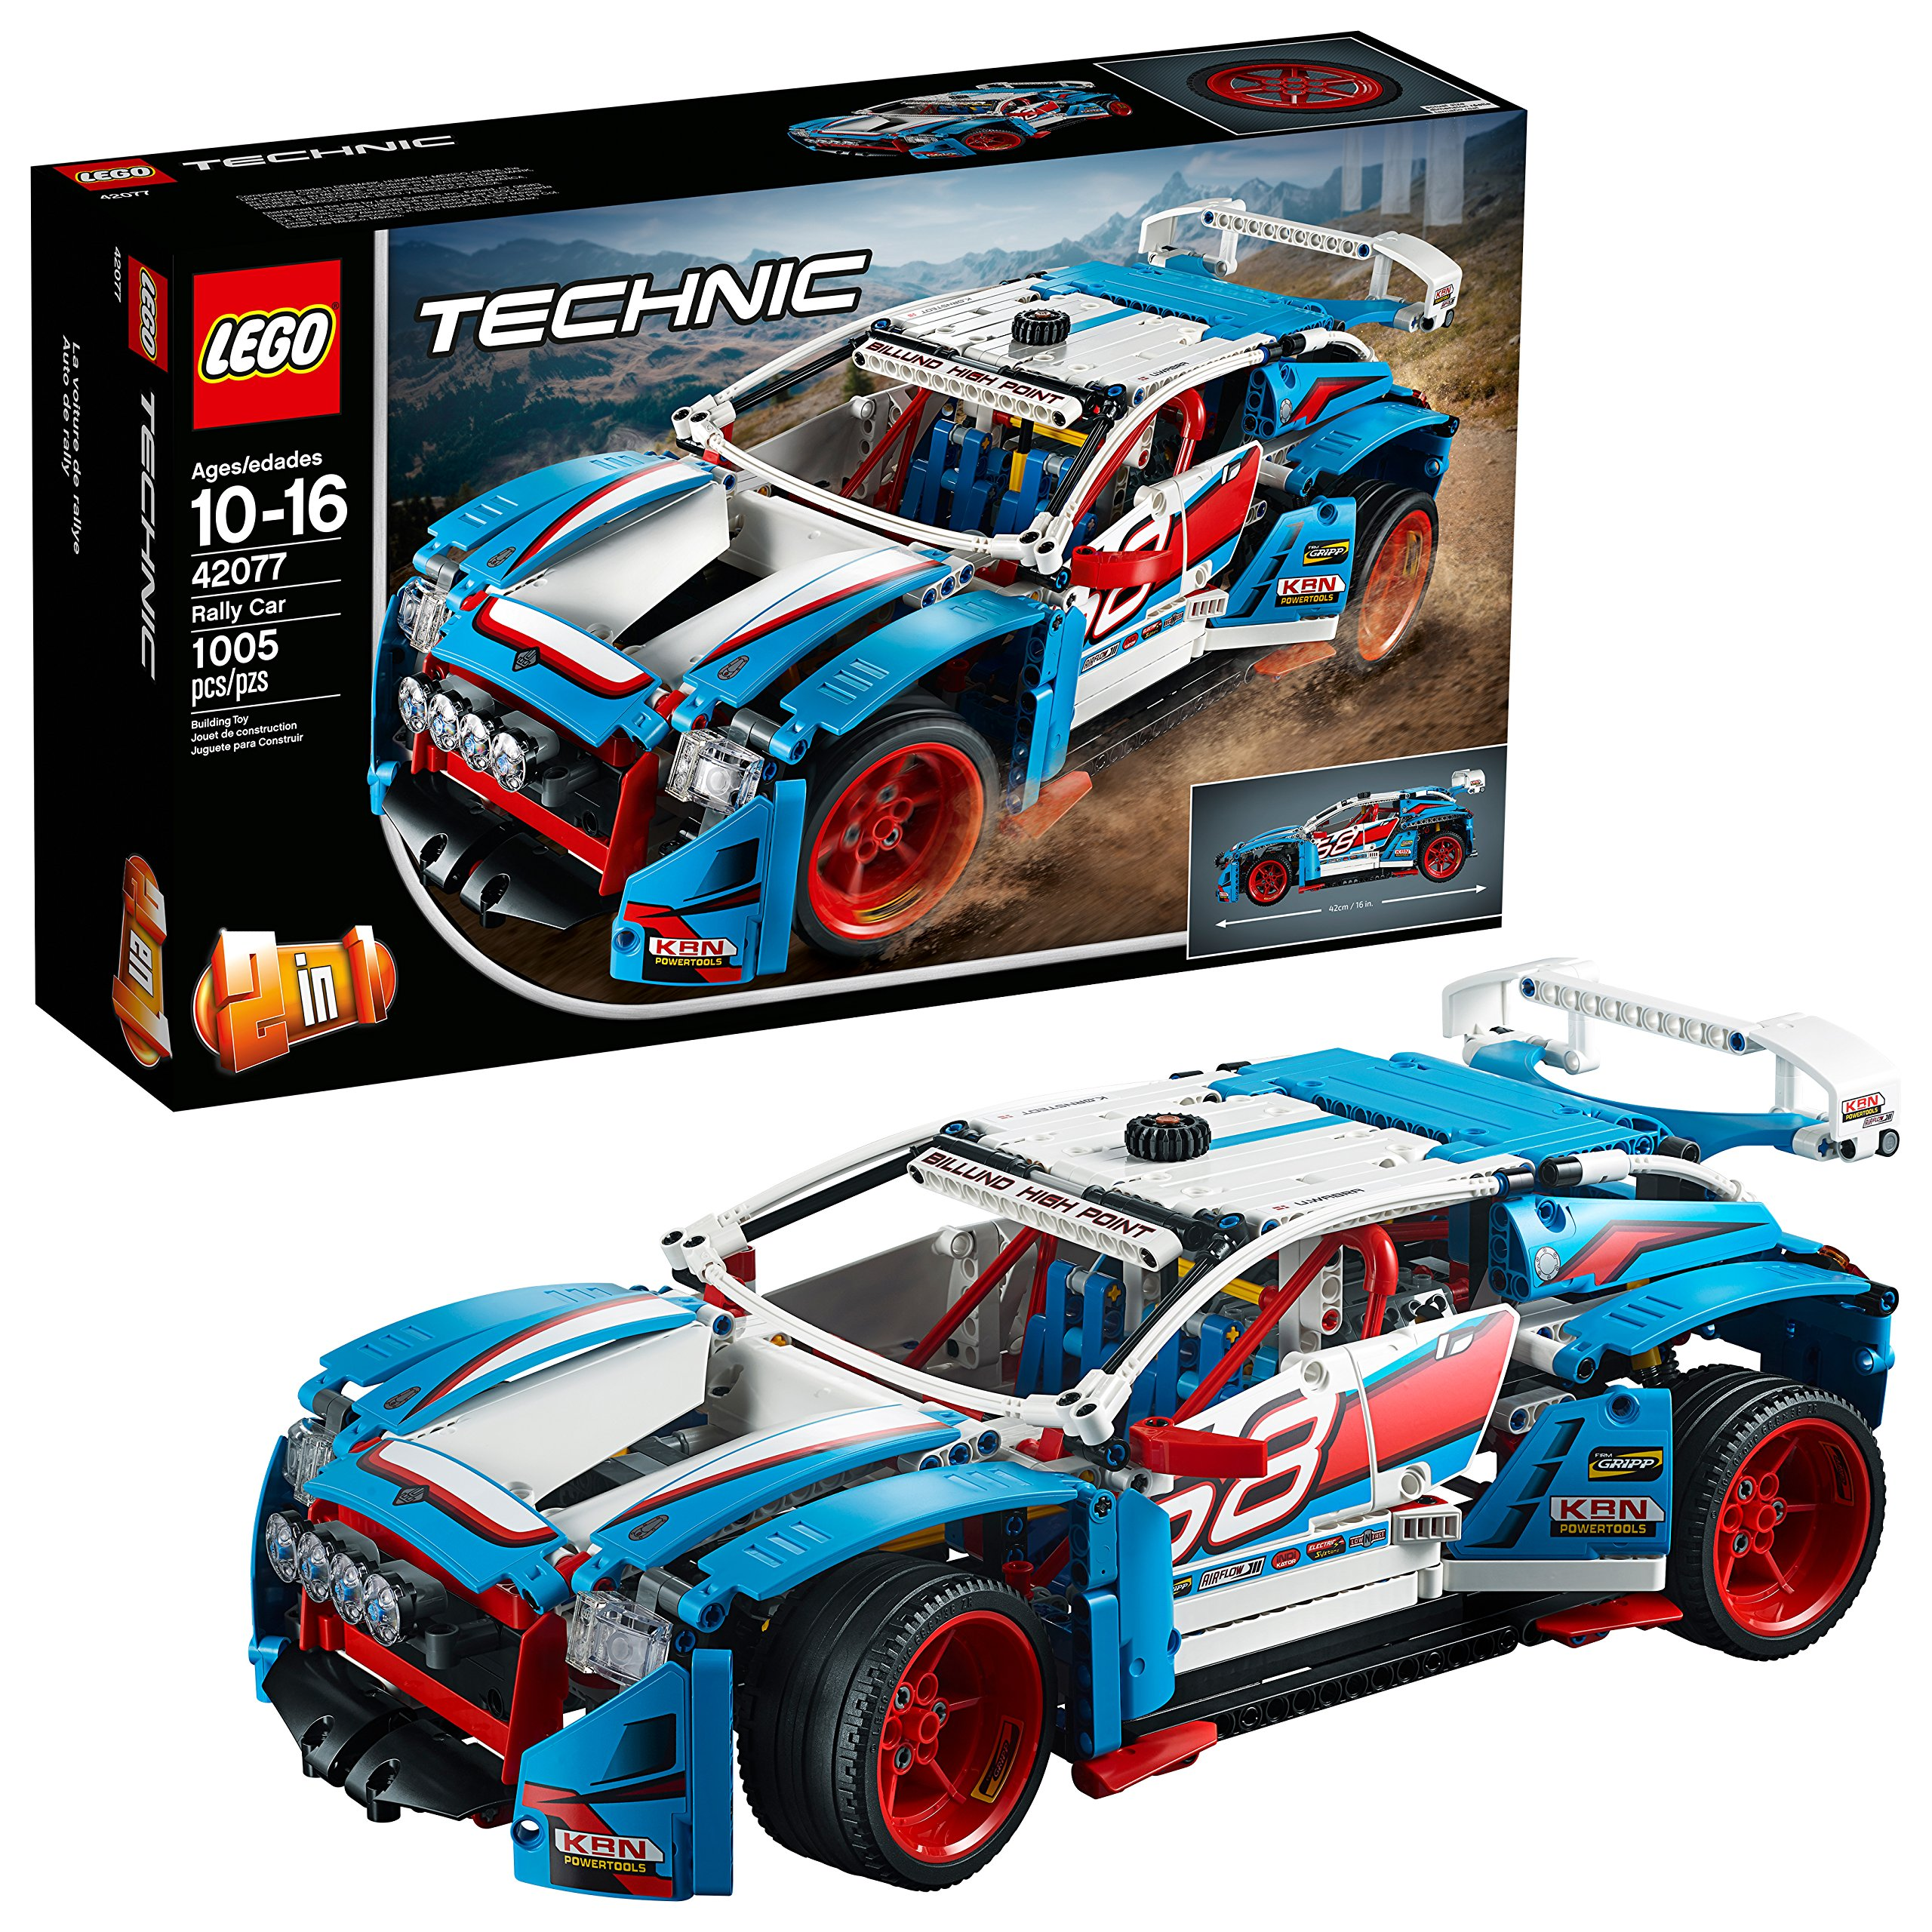 LEGO Technic Rally Car 42077 Building Kit (1005 Piece)